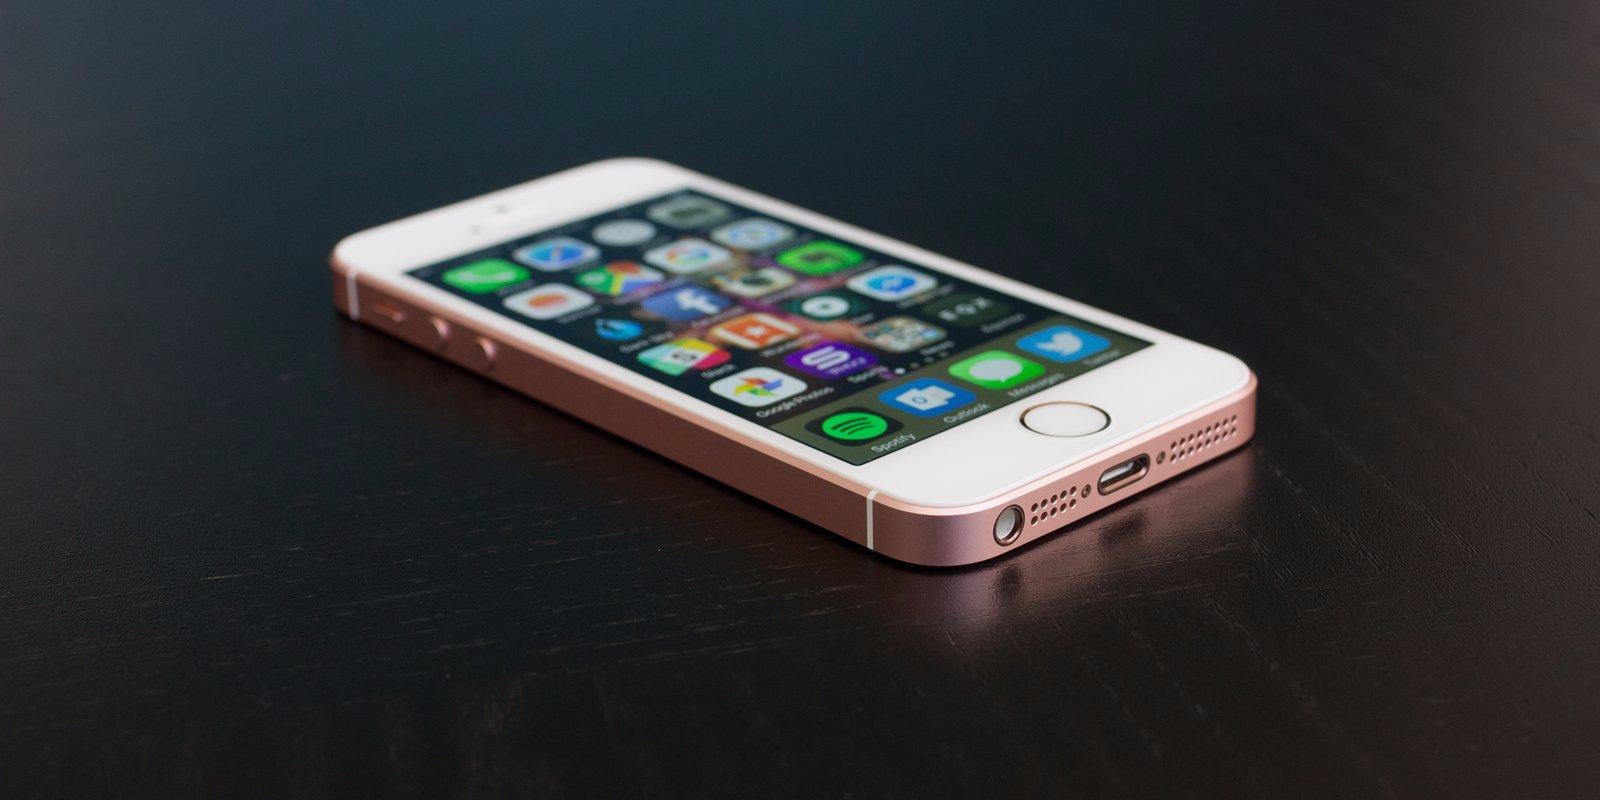 Apple iPhone SE Gadget Review